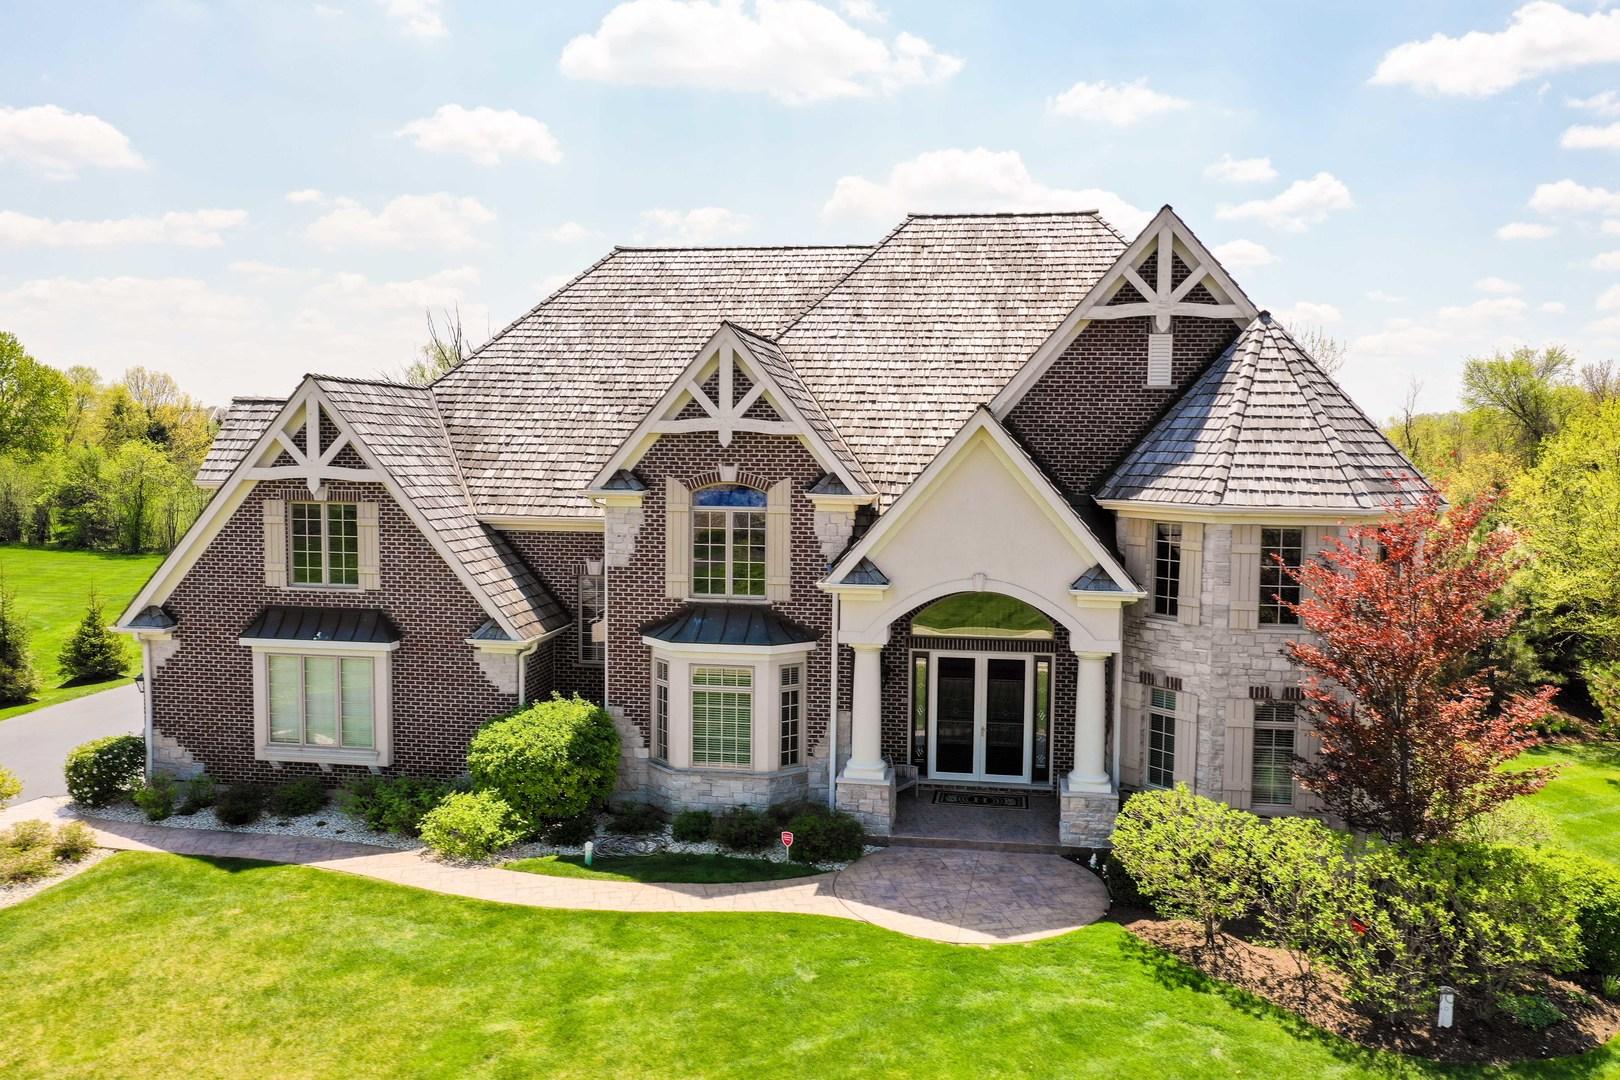 19909 Stone Pond Lane, Long Grove, Illinois 60047